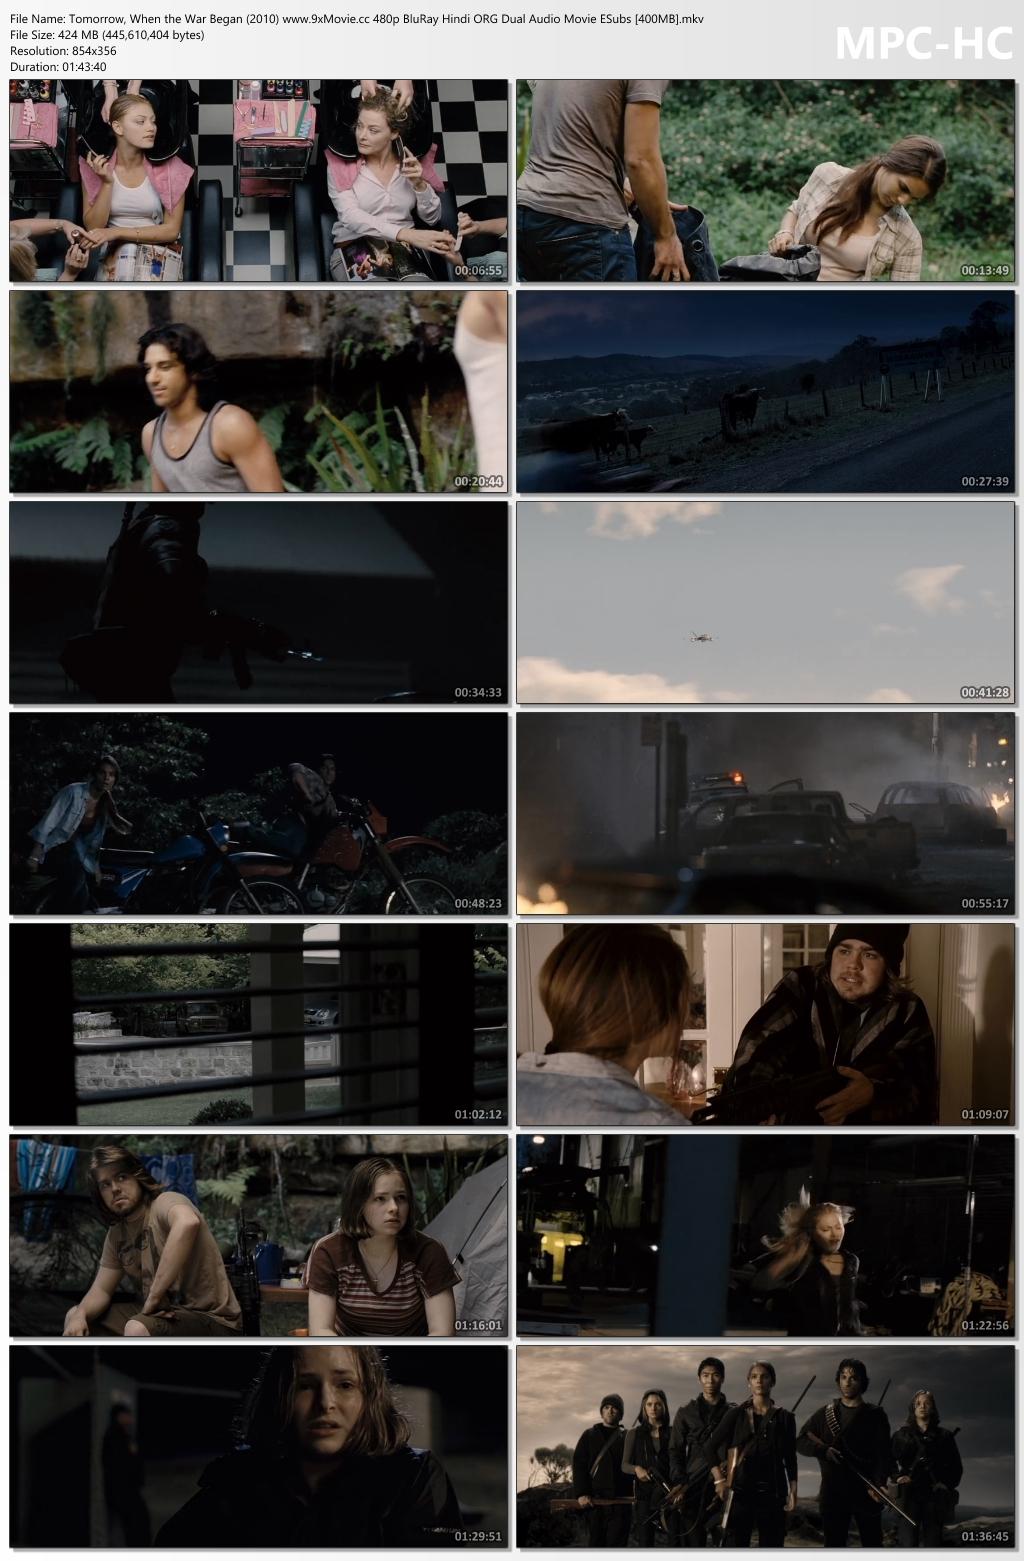 Tomorrow-When-the-War-Began-2010-www-9x-Movie-cc-480p-Blu-Ray-Hindi-ORG-Dual-Audio-Movie-ESubs-400-M